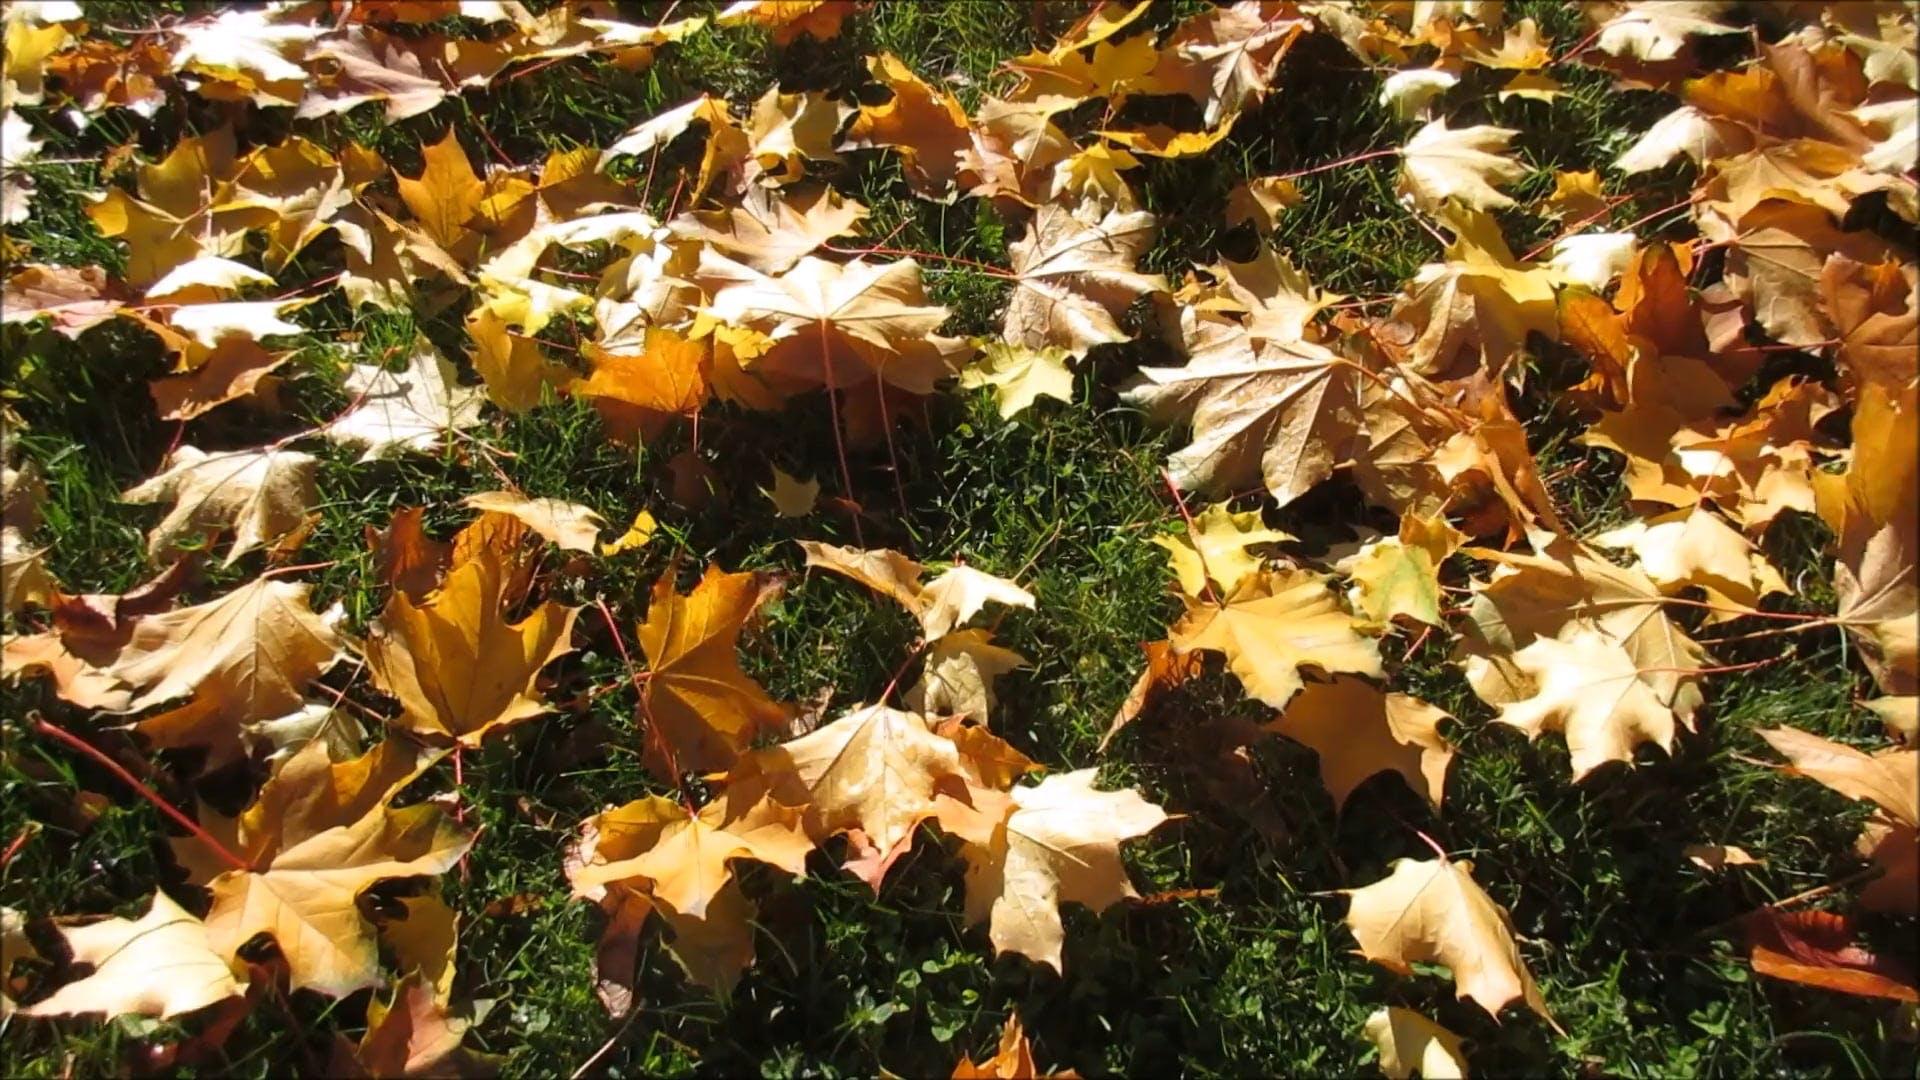 Dry Leaves On Ground